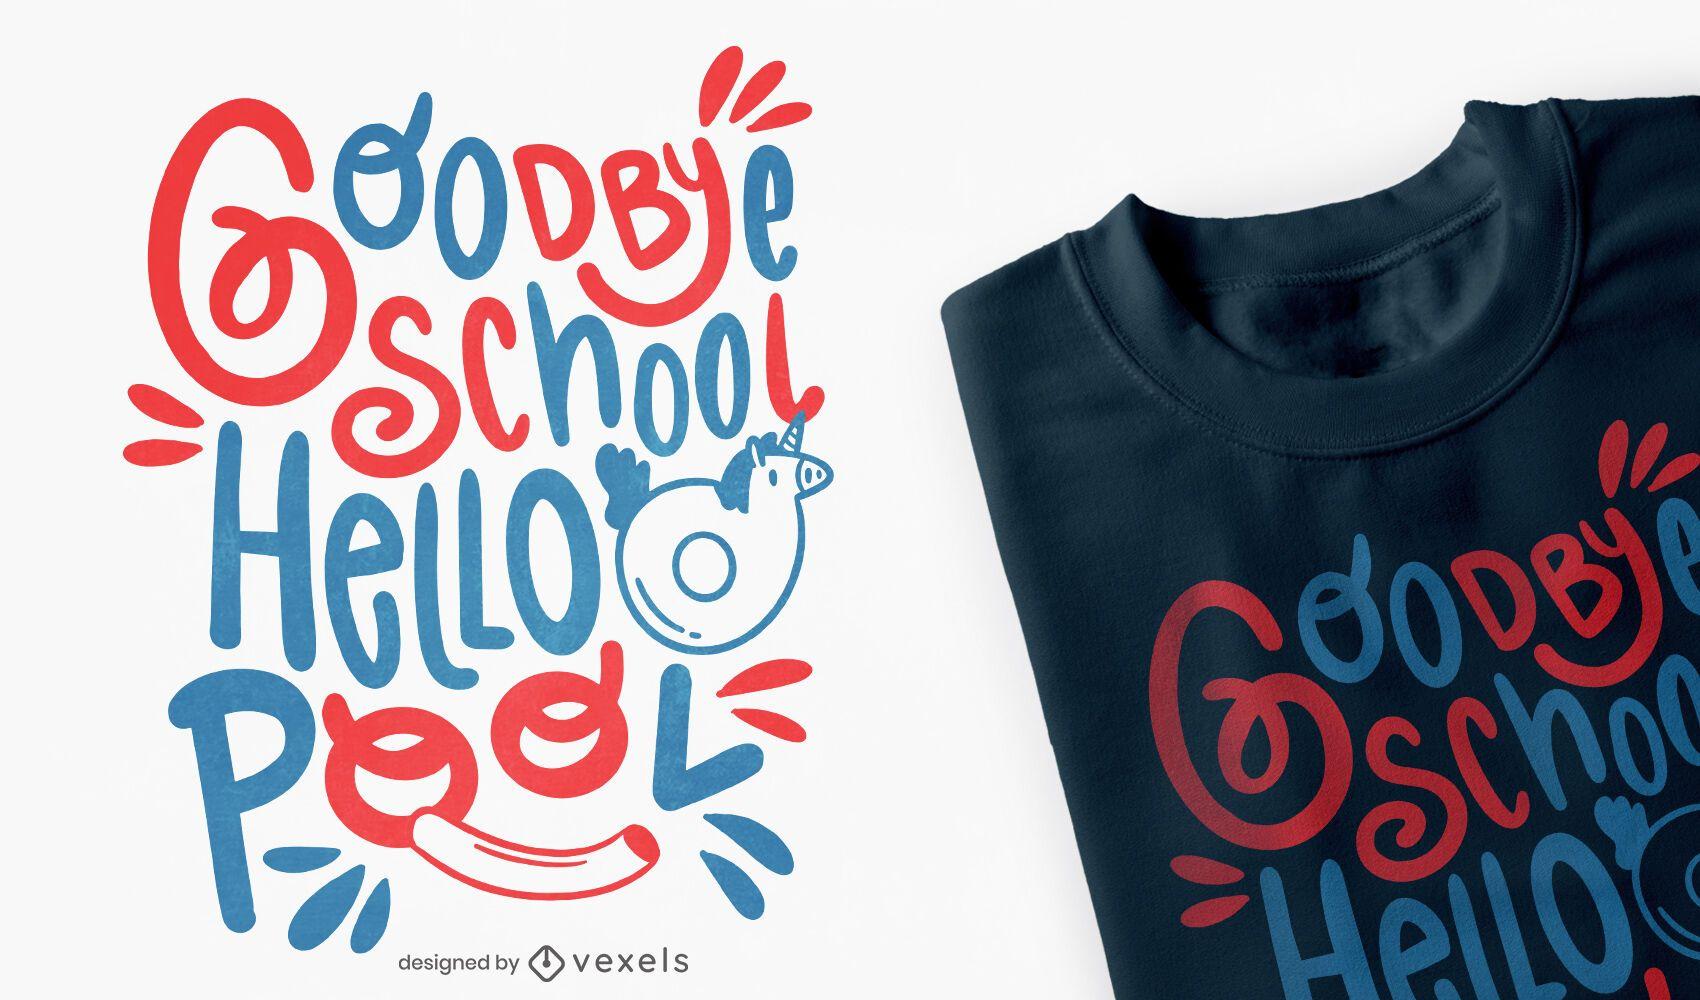 Goodbye school summertime t-shirt design